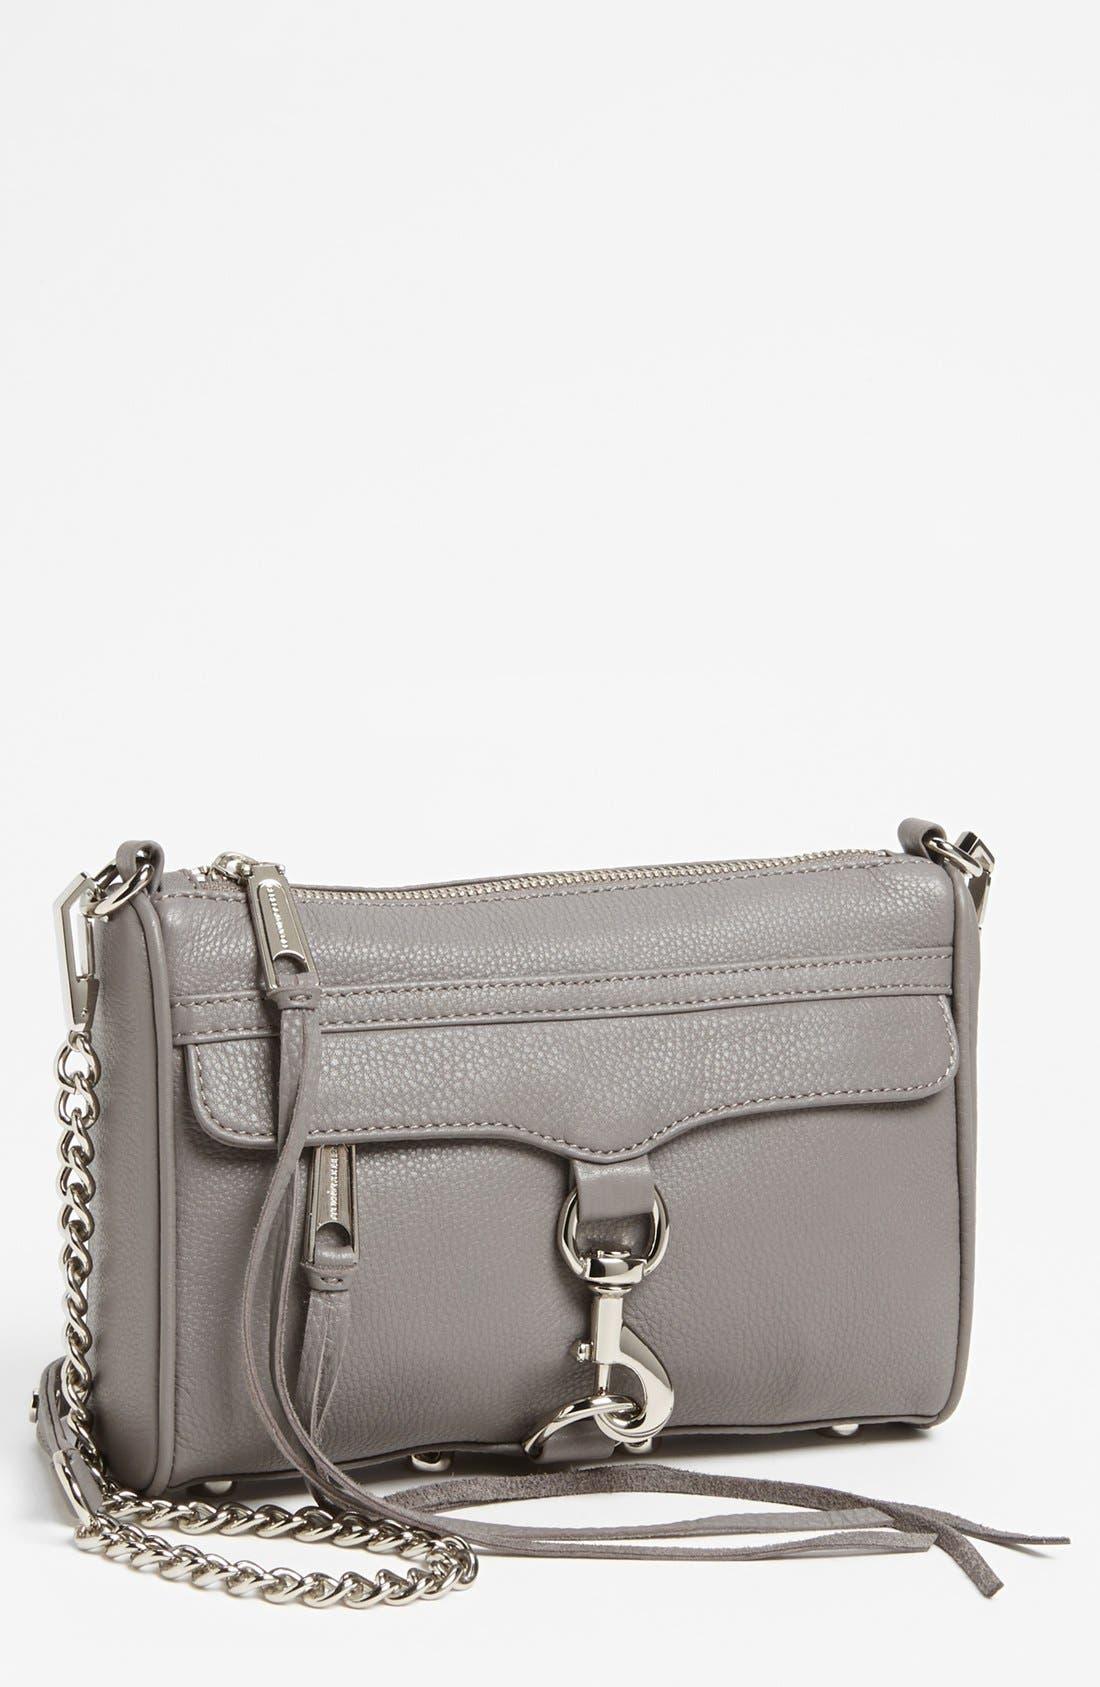 Main Image - Rebecca Minkoff 'Mini MAC' Convertible Crossbody Bag